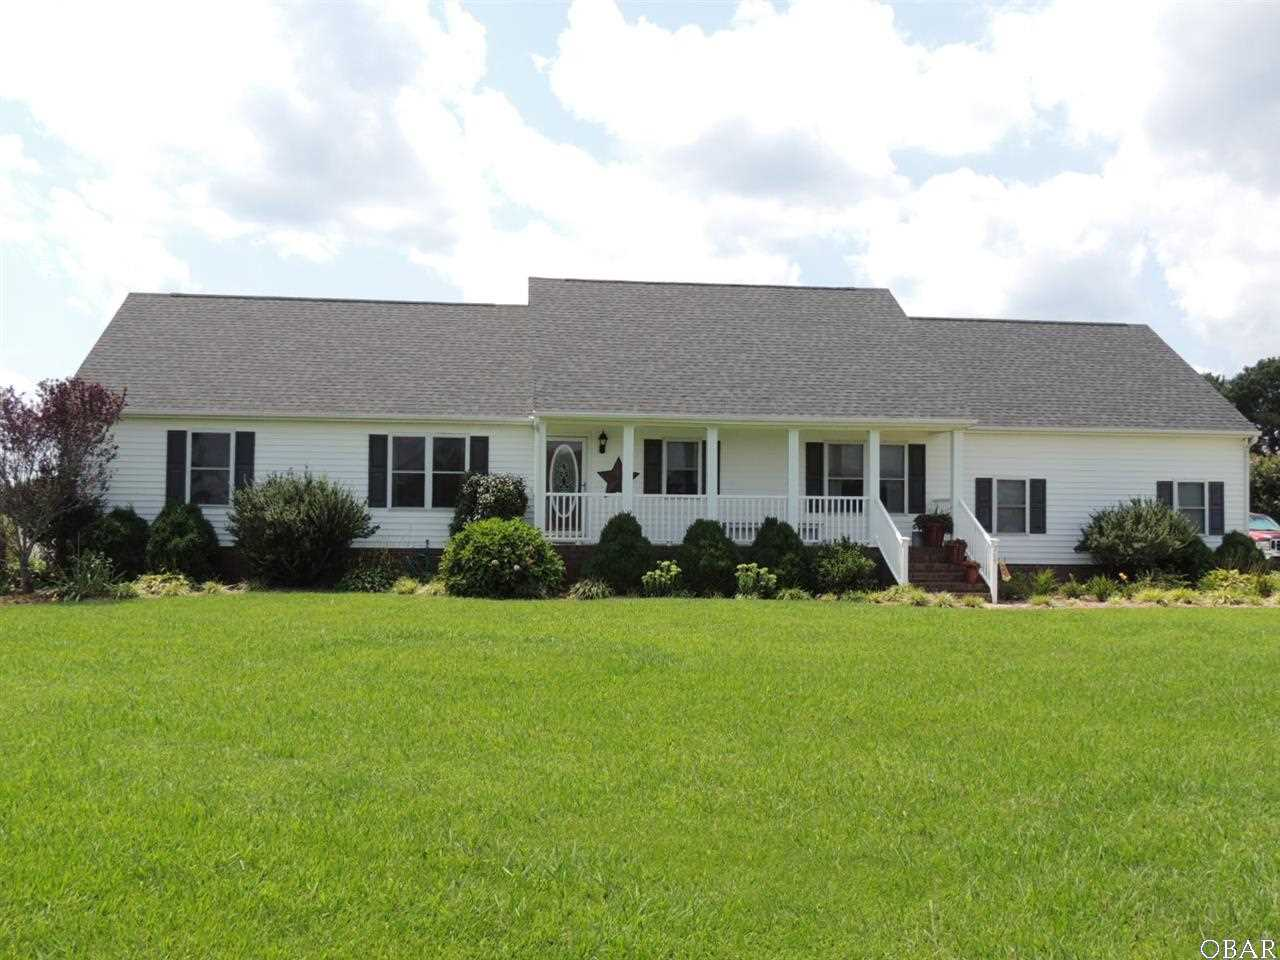 269 Sharon Church Road,South Mills,NC 27976,3 Bedrooms Bedrooms,3 BathroomsBathrooms,Residential,Sharon Church Road,84676